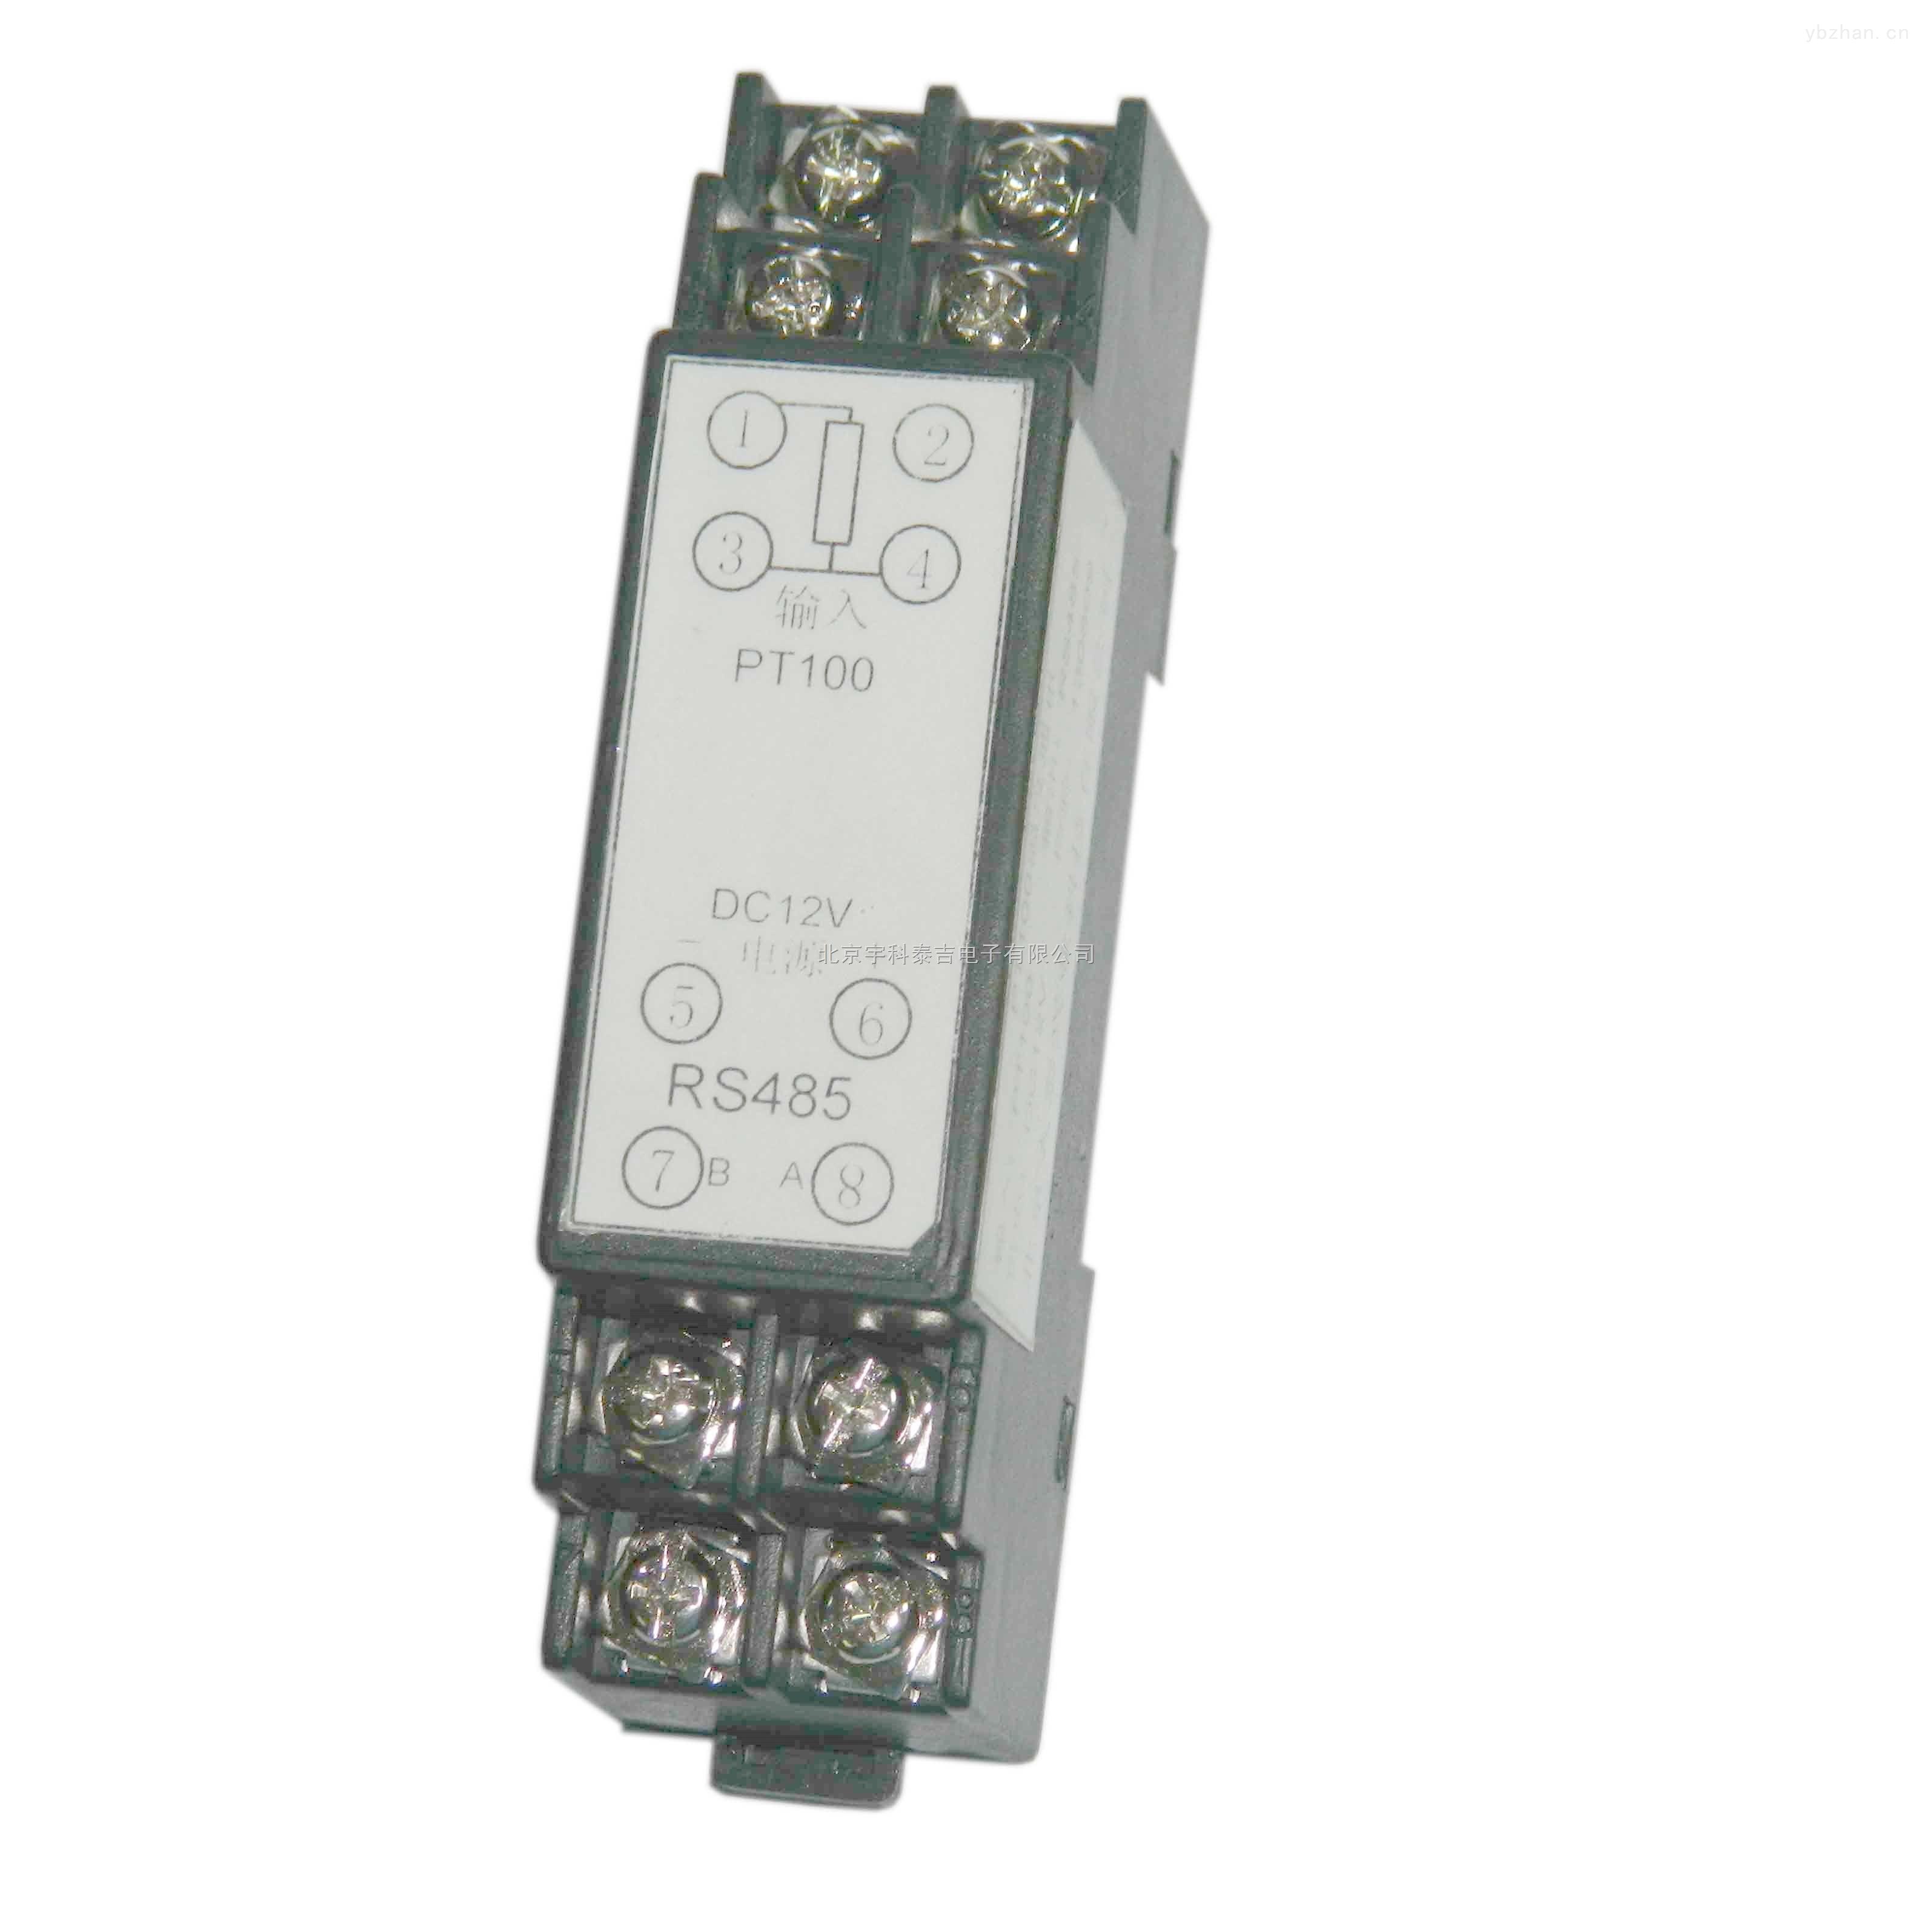 PLC柜子里的K型温度变送器,K型热电偶输入,RS485输出modbus标准协议